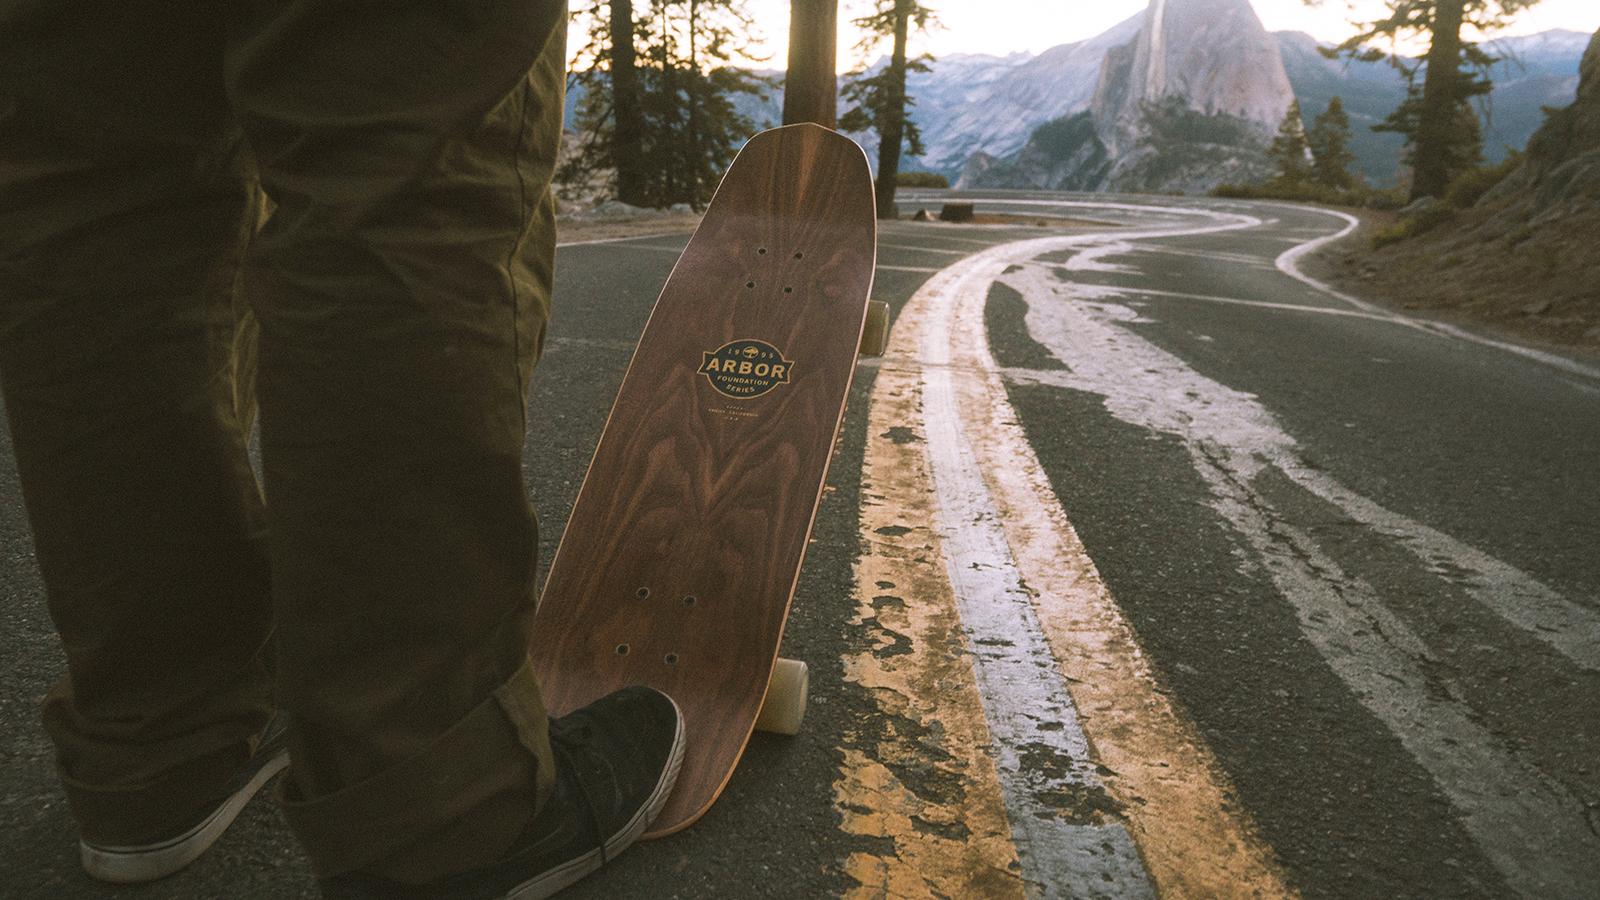 Arbor-Skateboards-Shot-By-Caleb-Keller